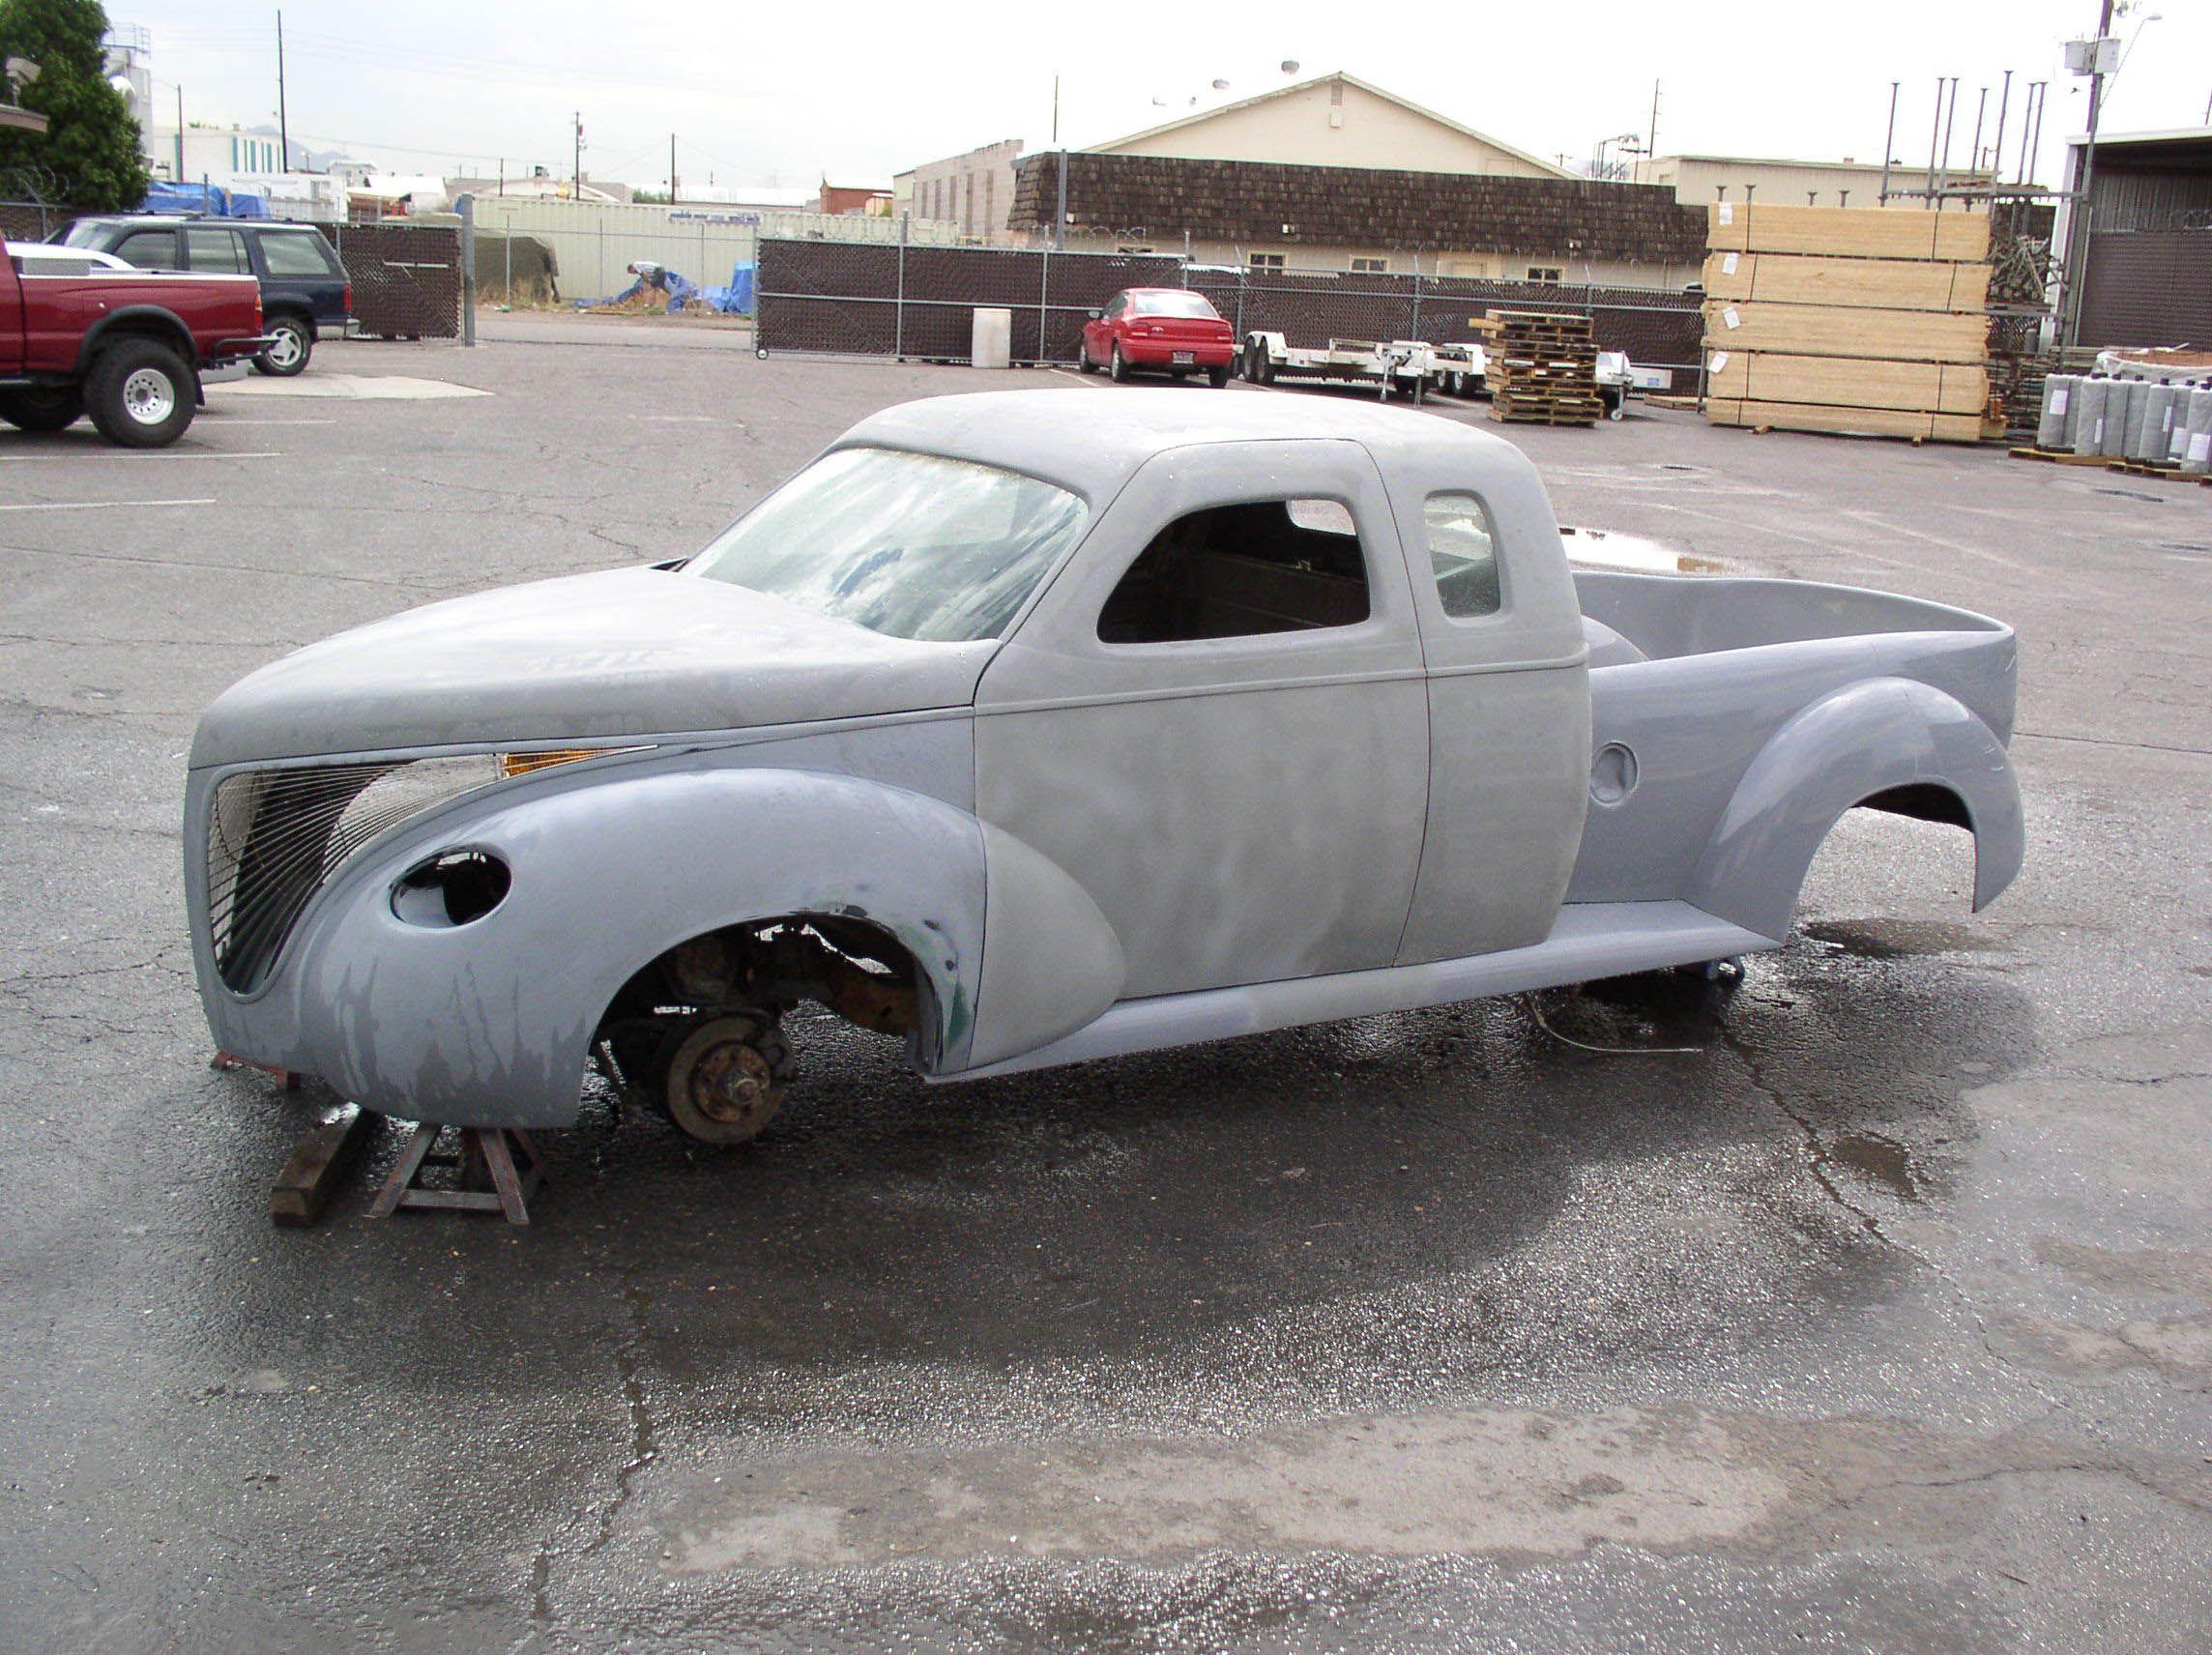 abarth and fiat conceptcarz coupe image com fiberglass news body information